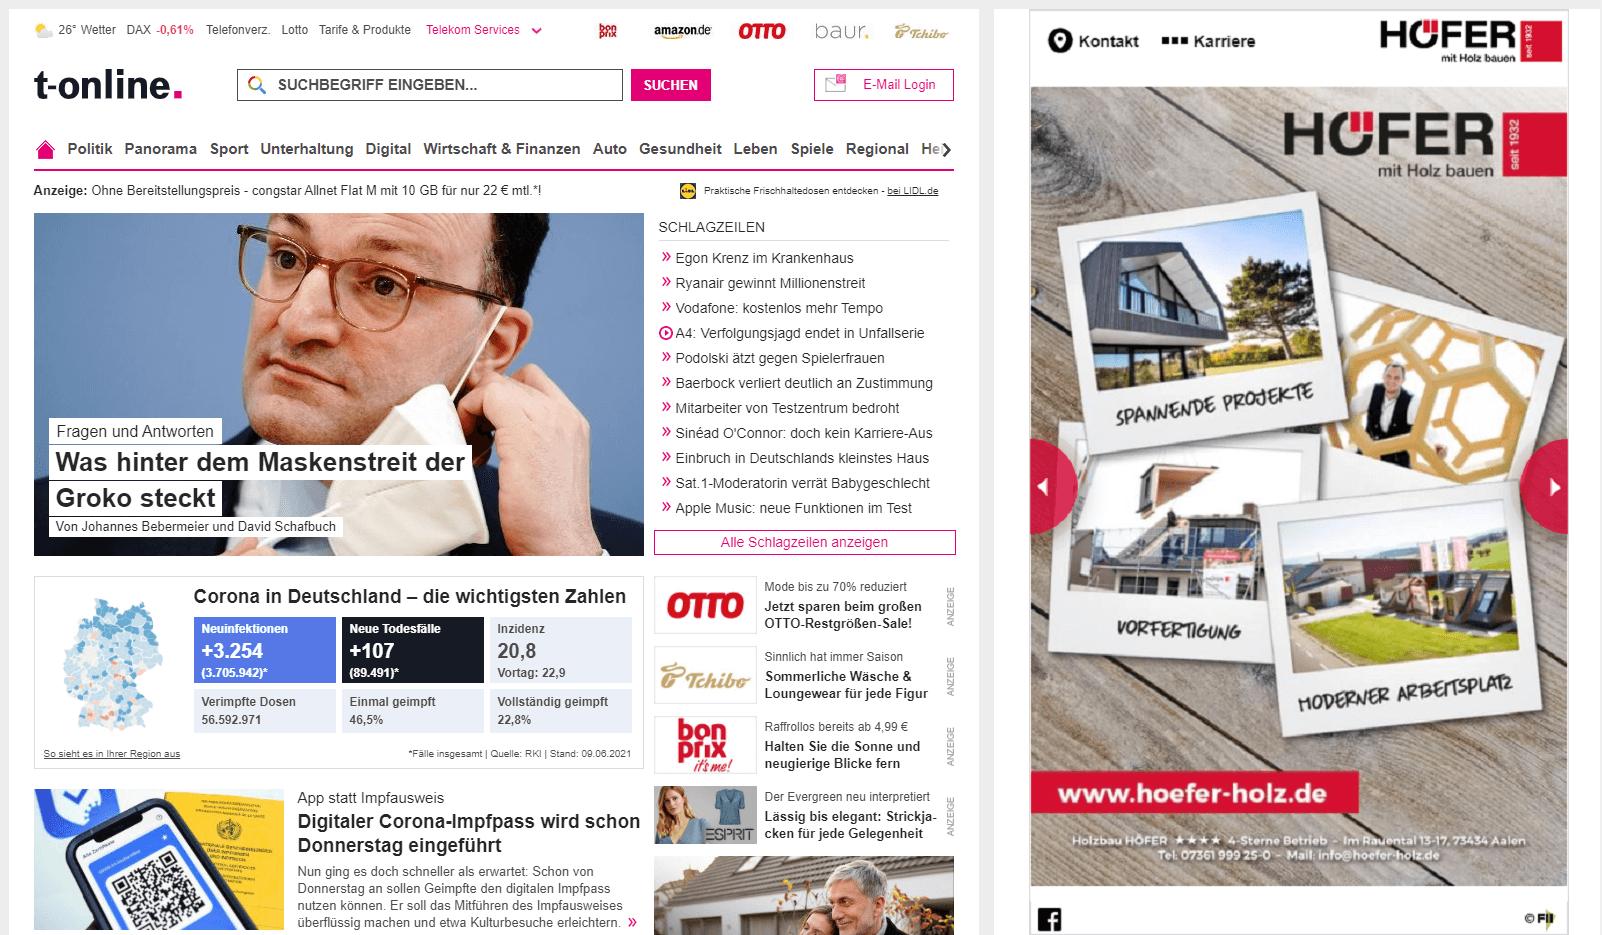 content-engagement-ad_insert